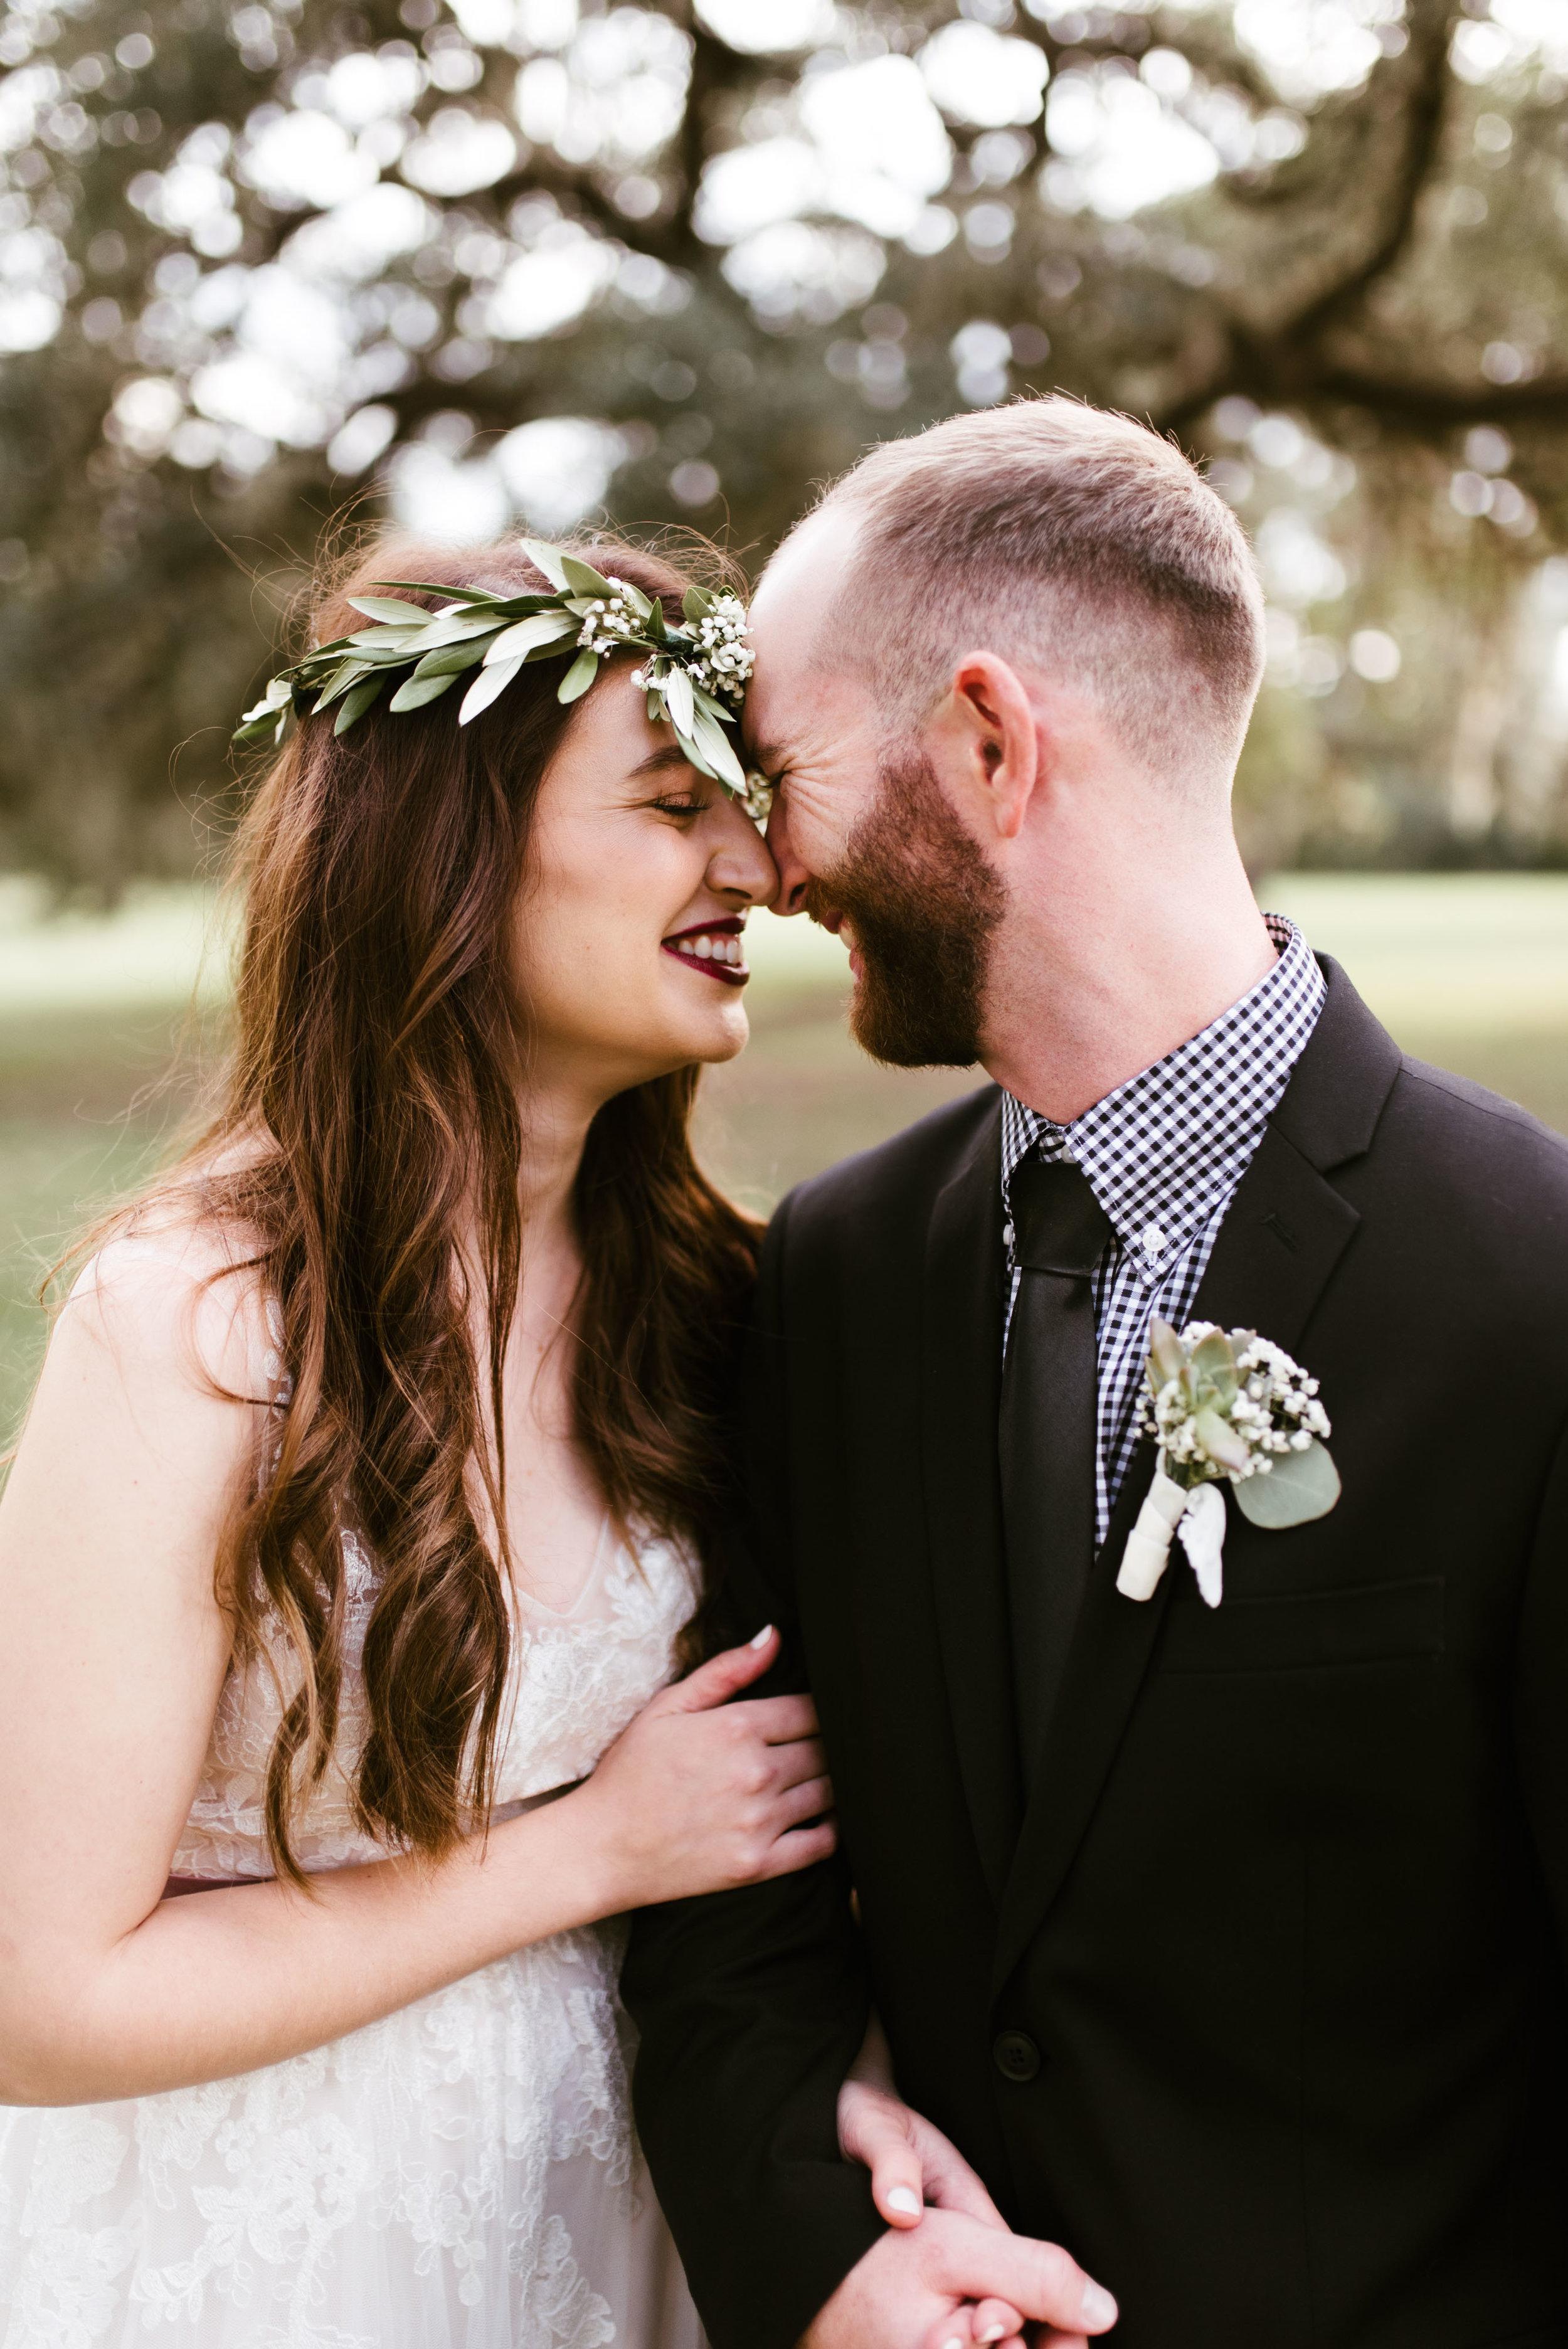 Columbus, Texas Wedding | Houston Natural Light Wedding Photographer | www.jordanmitchellphotography.com